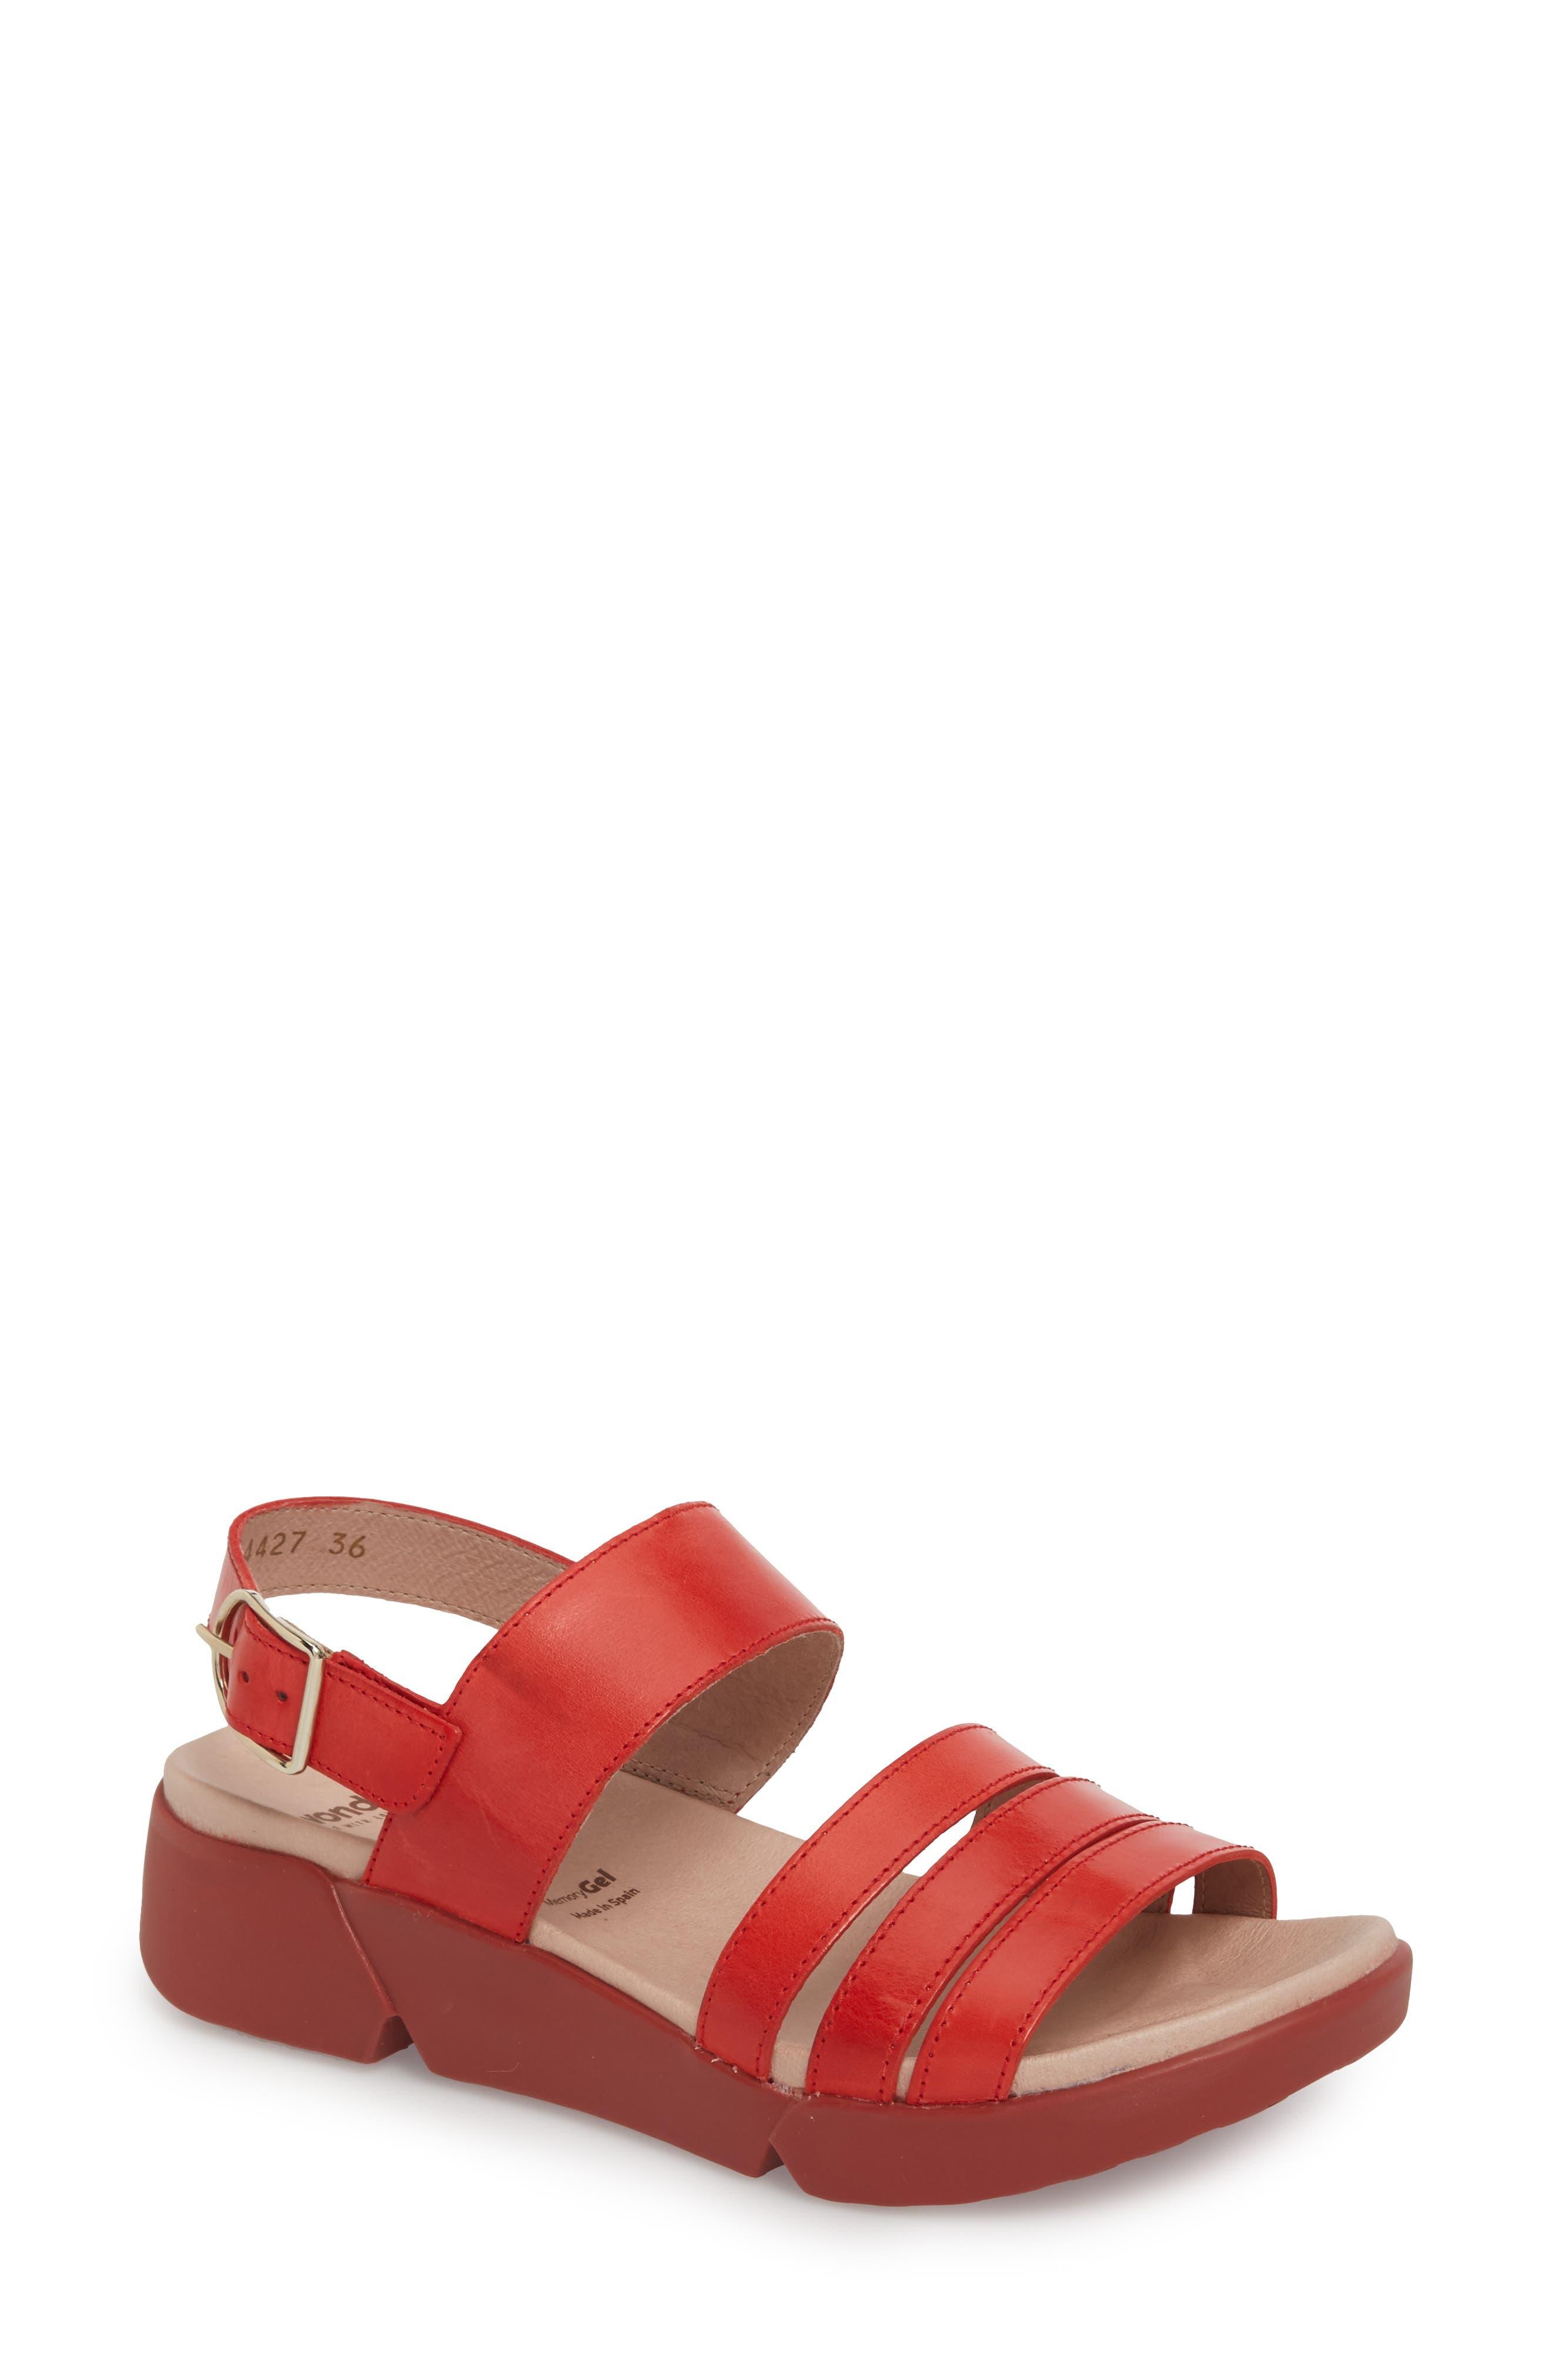 Wonders A-8004 Sandal, Red